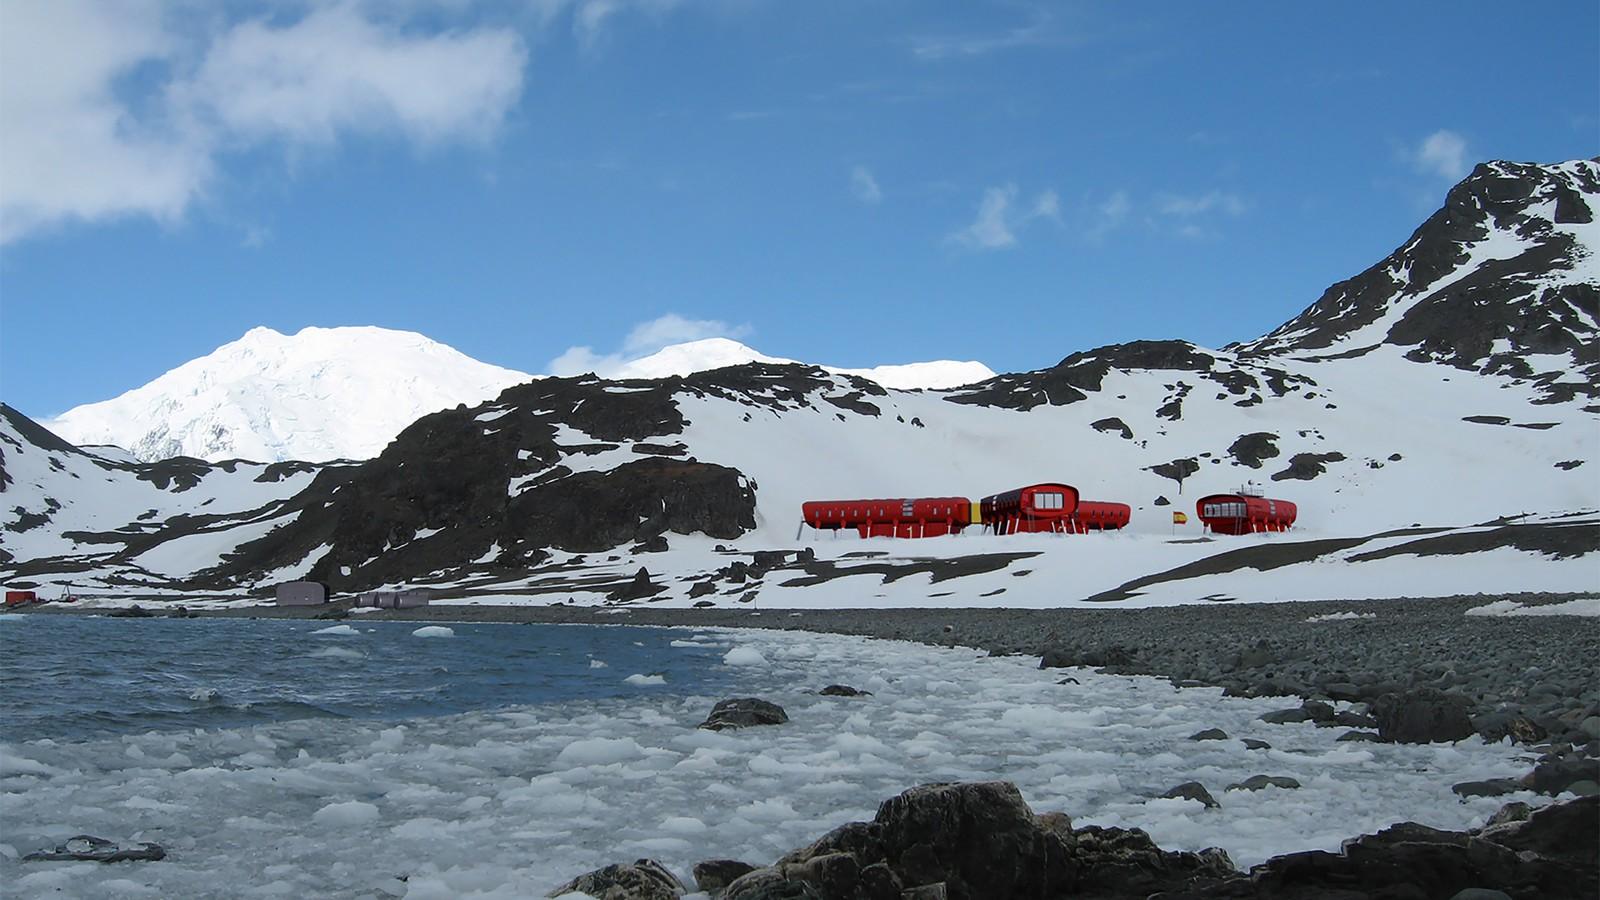 Juan Carlos 1 Spanish Antarctic Base 2